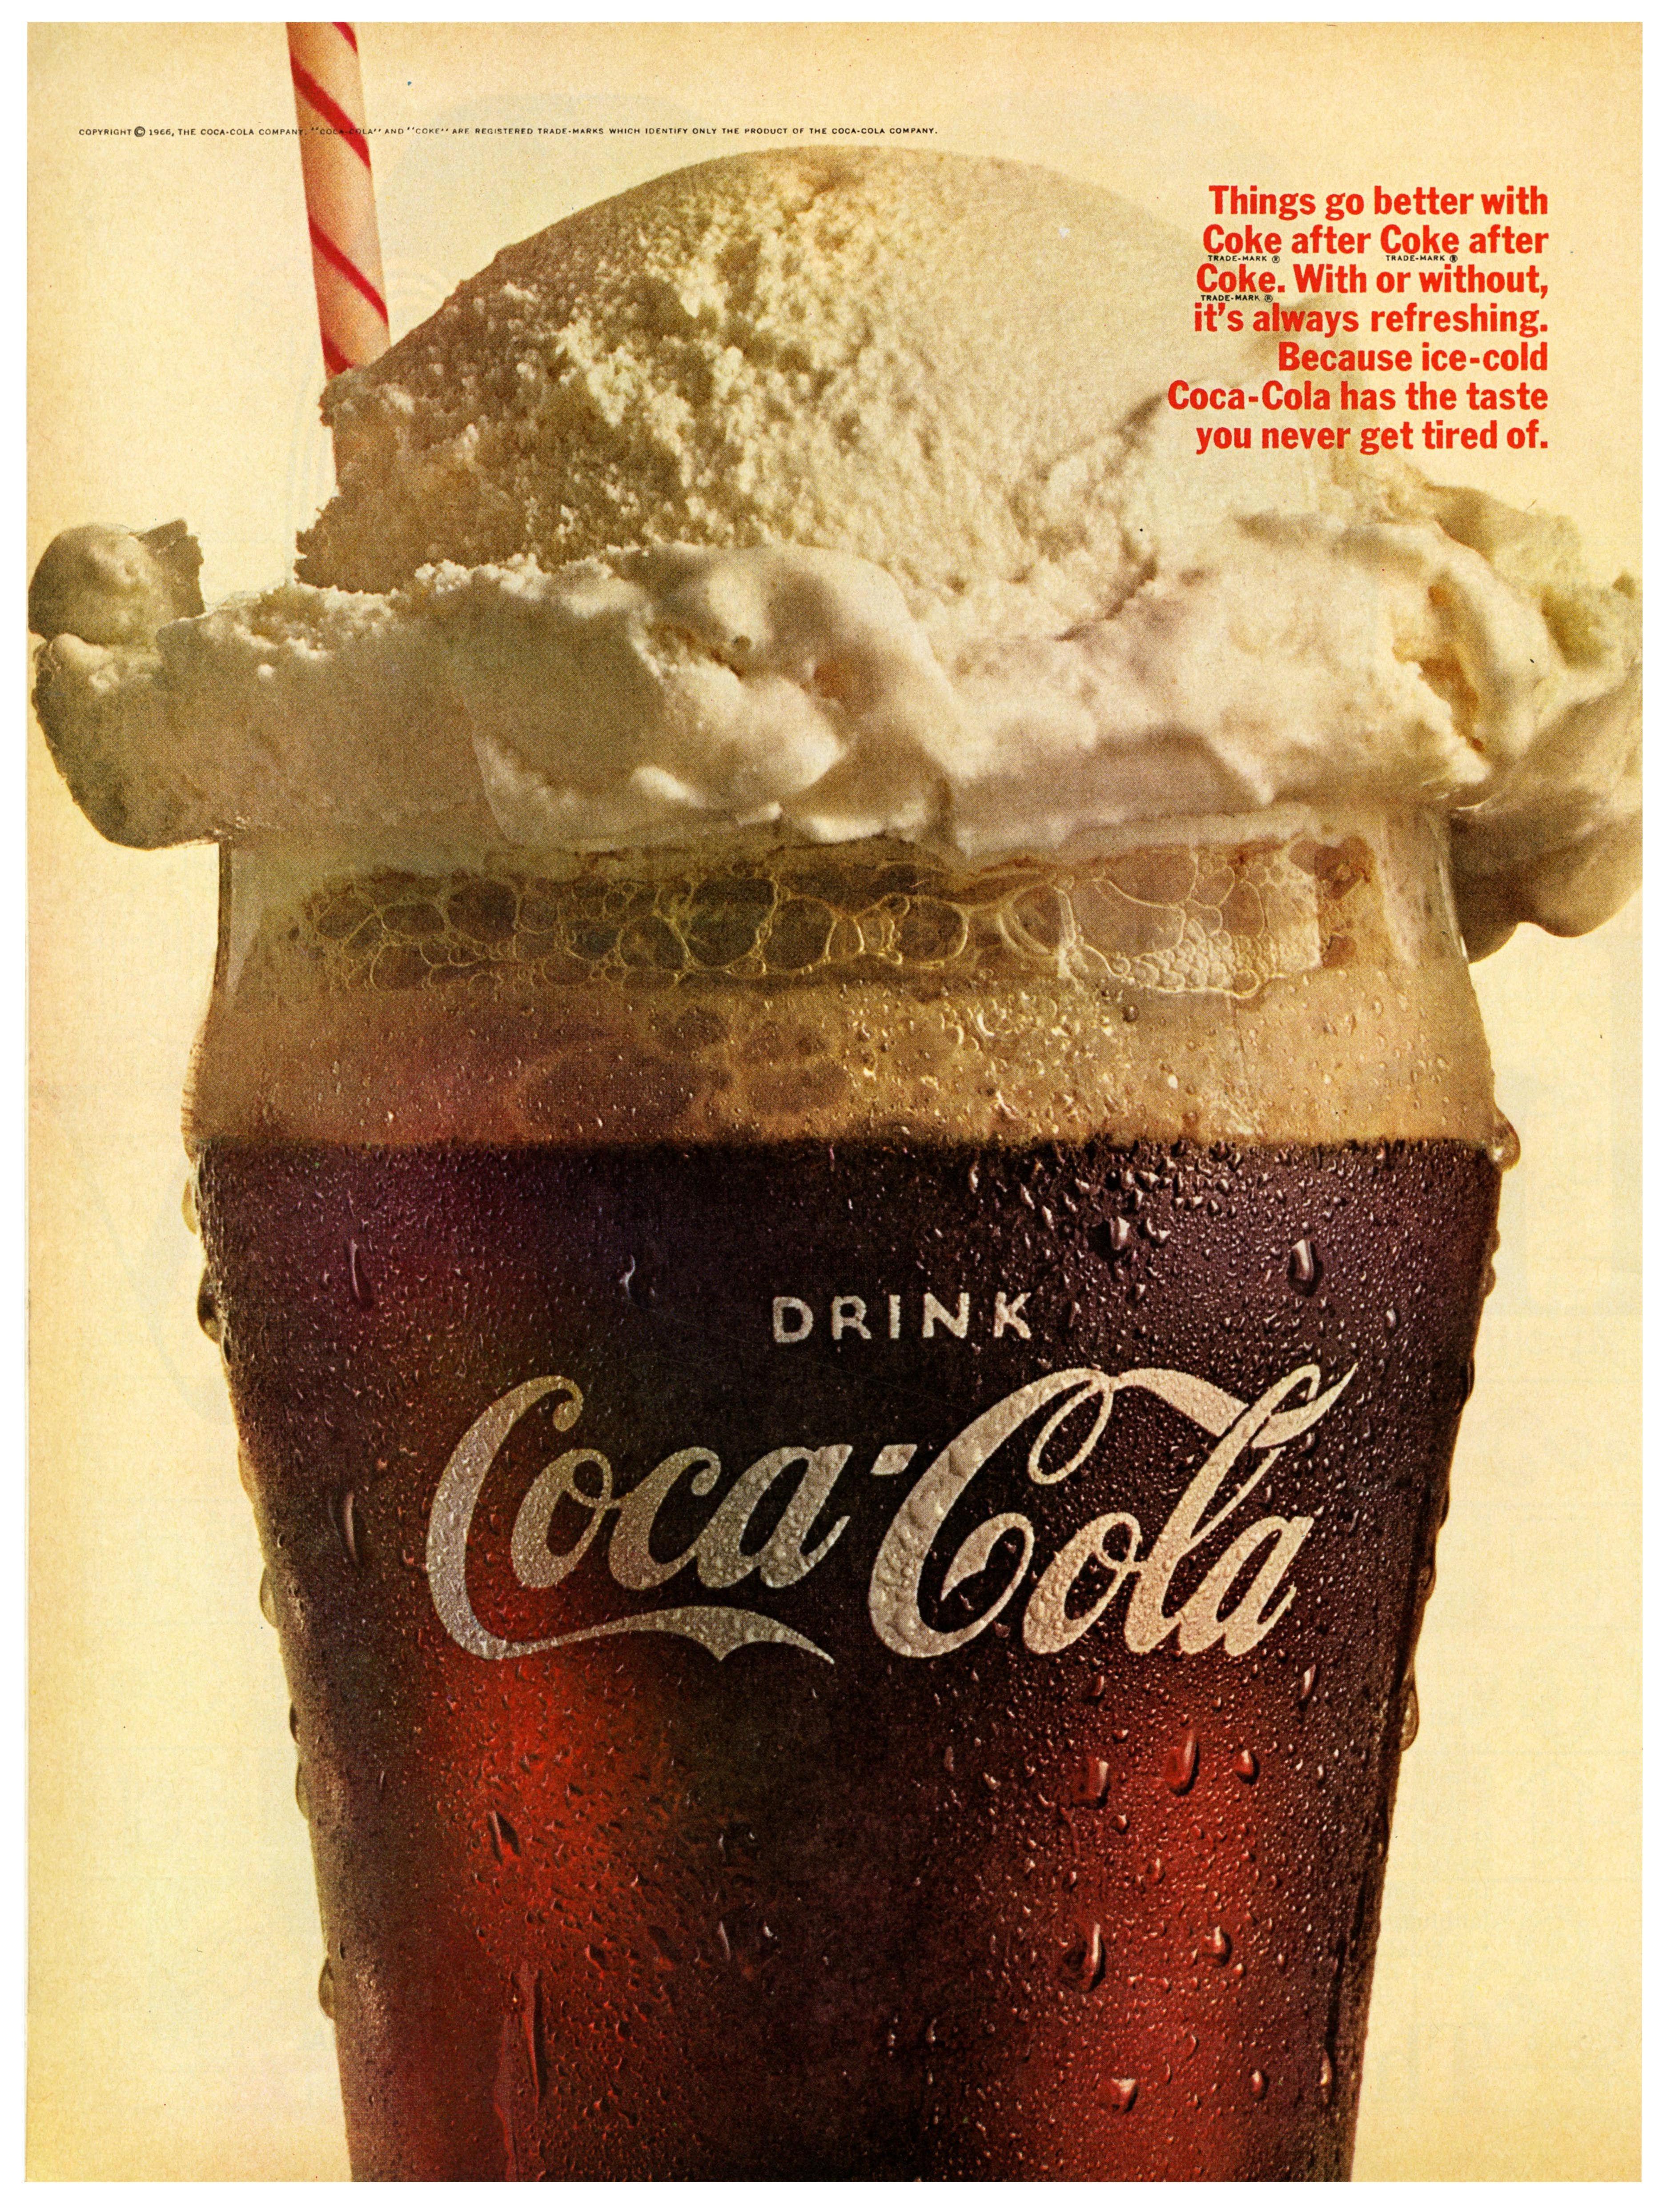 Coke Float 1965 | #vintage #retro #classic #ice cream #coke